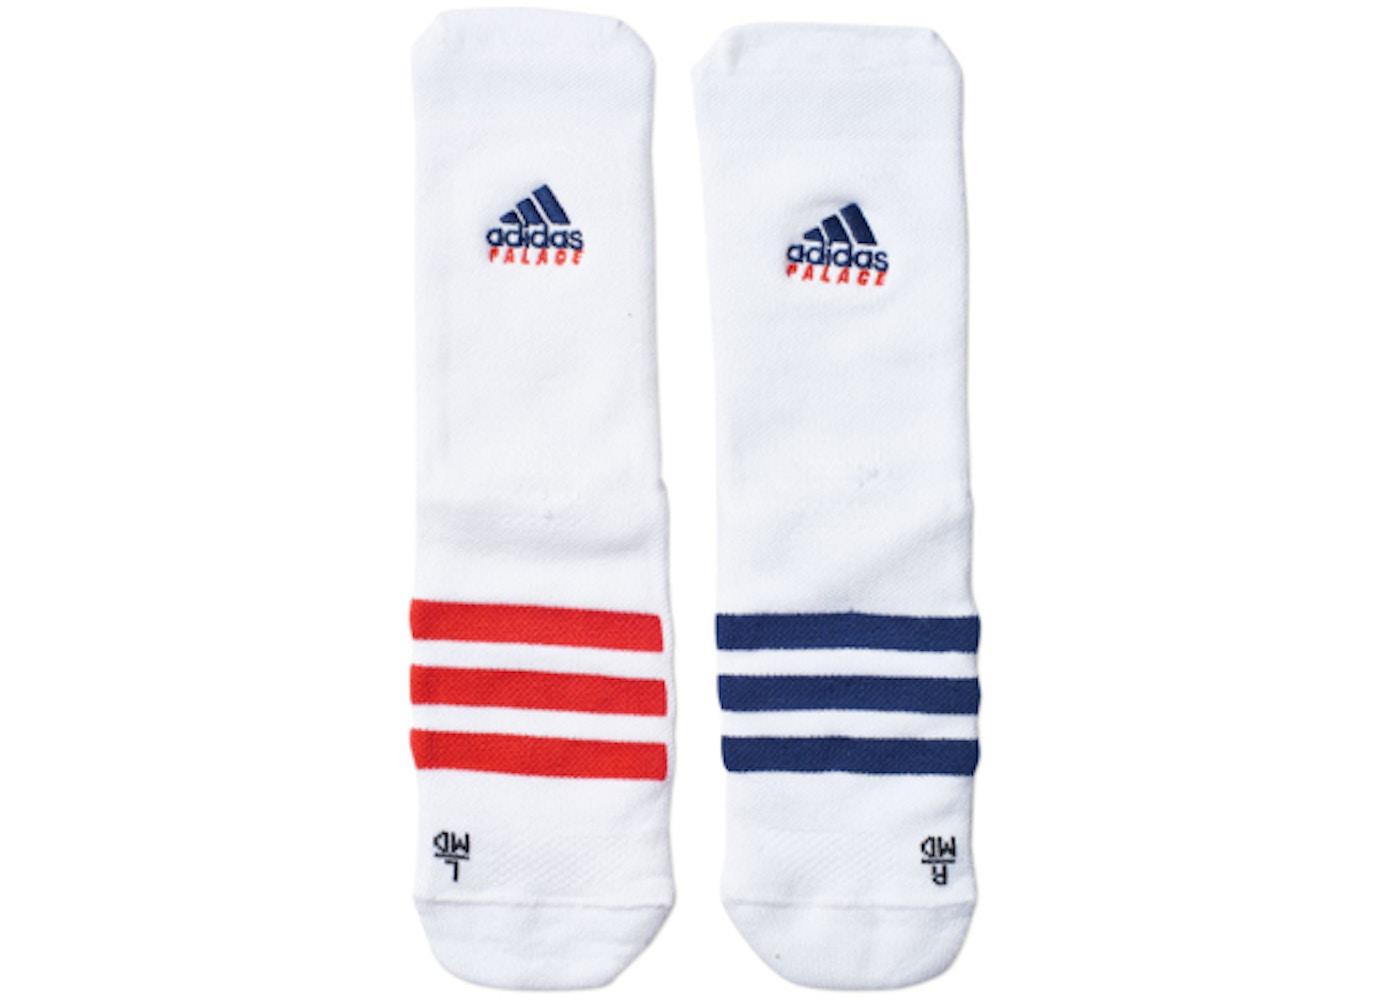 bb1167e8 Palace adidas On Court Socks White/Red/Dark Blue - SS18